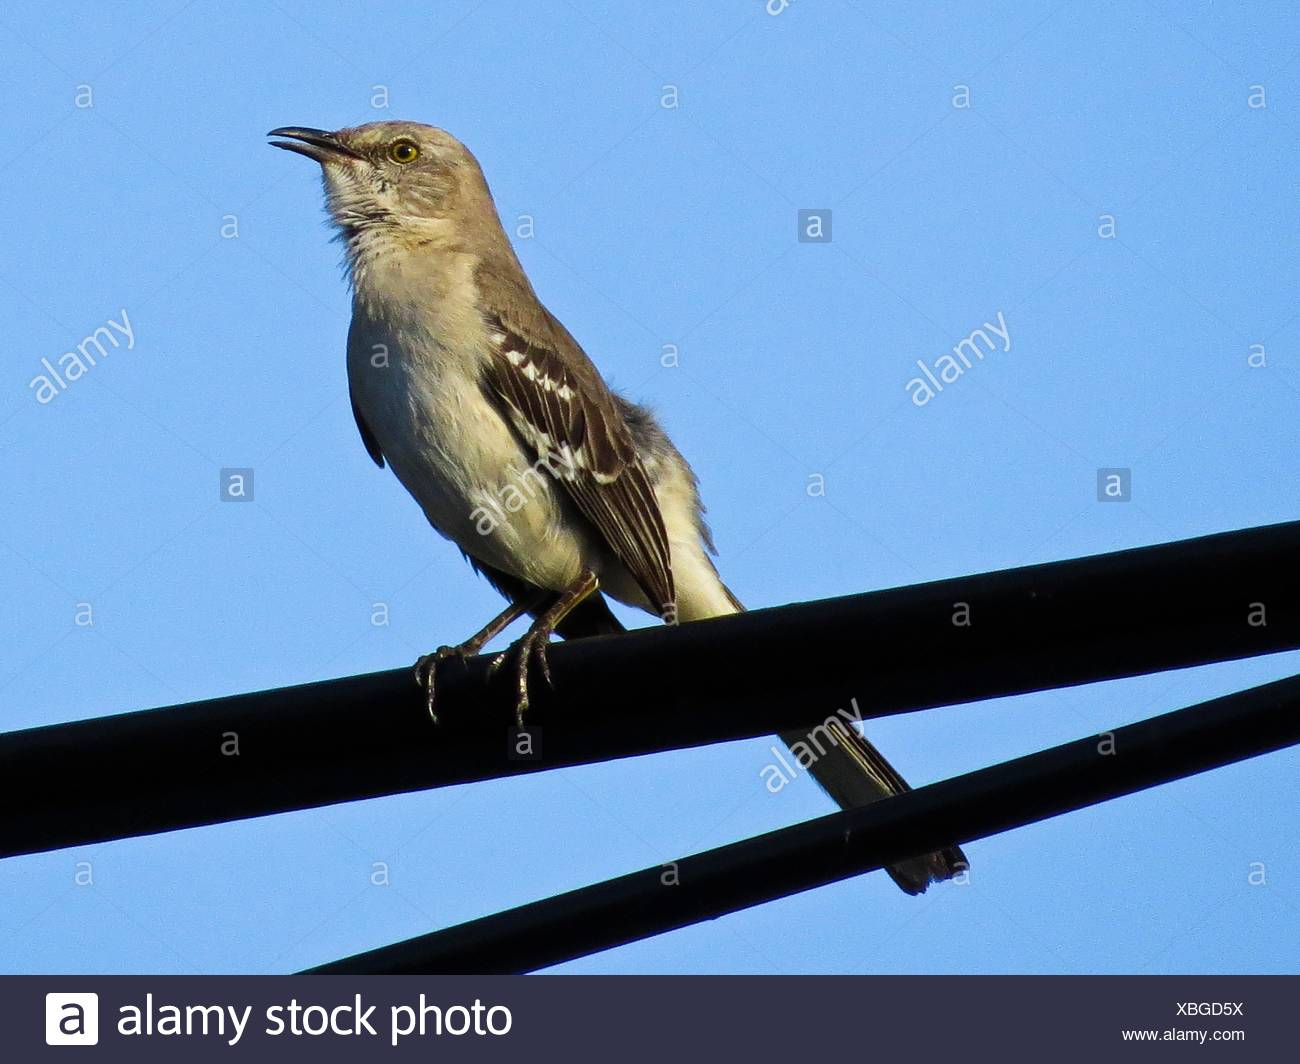 Northern mockingbird, Mimus polyglottos - Stock Image